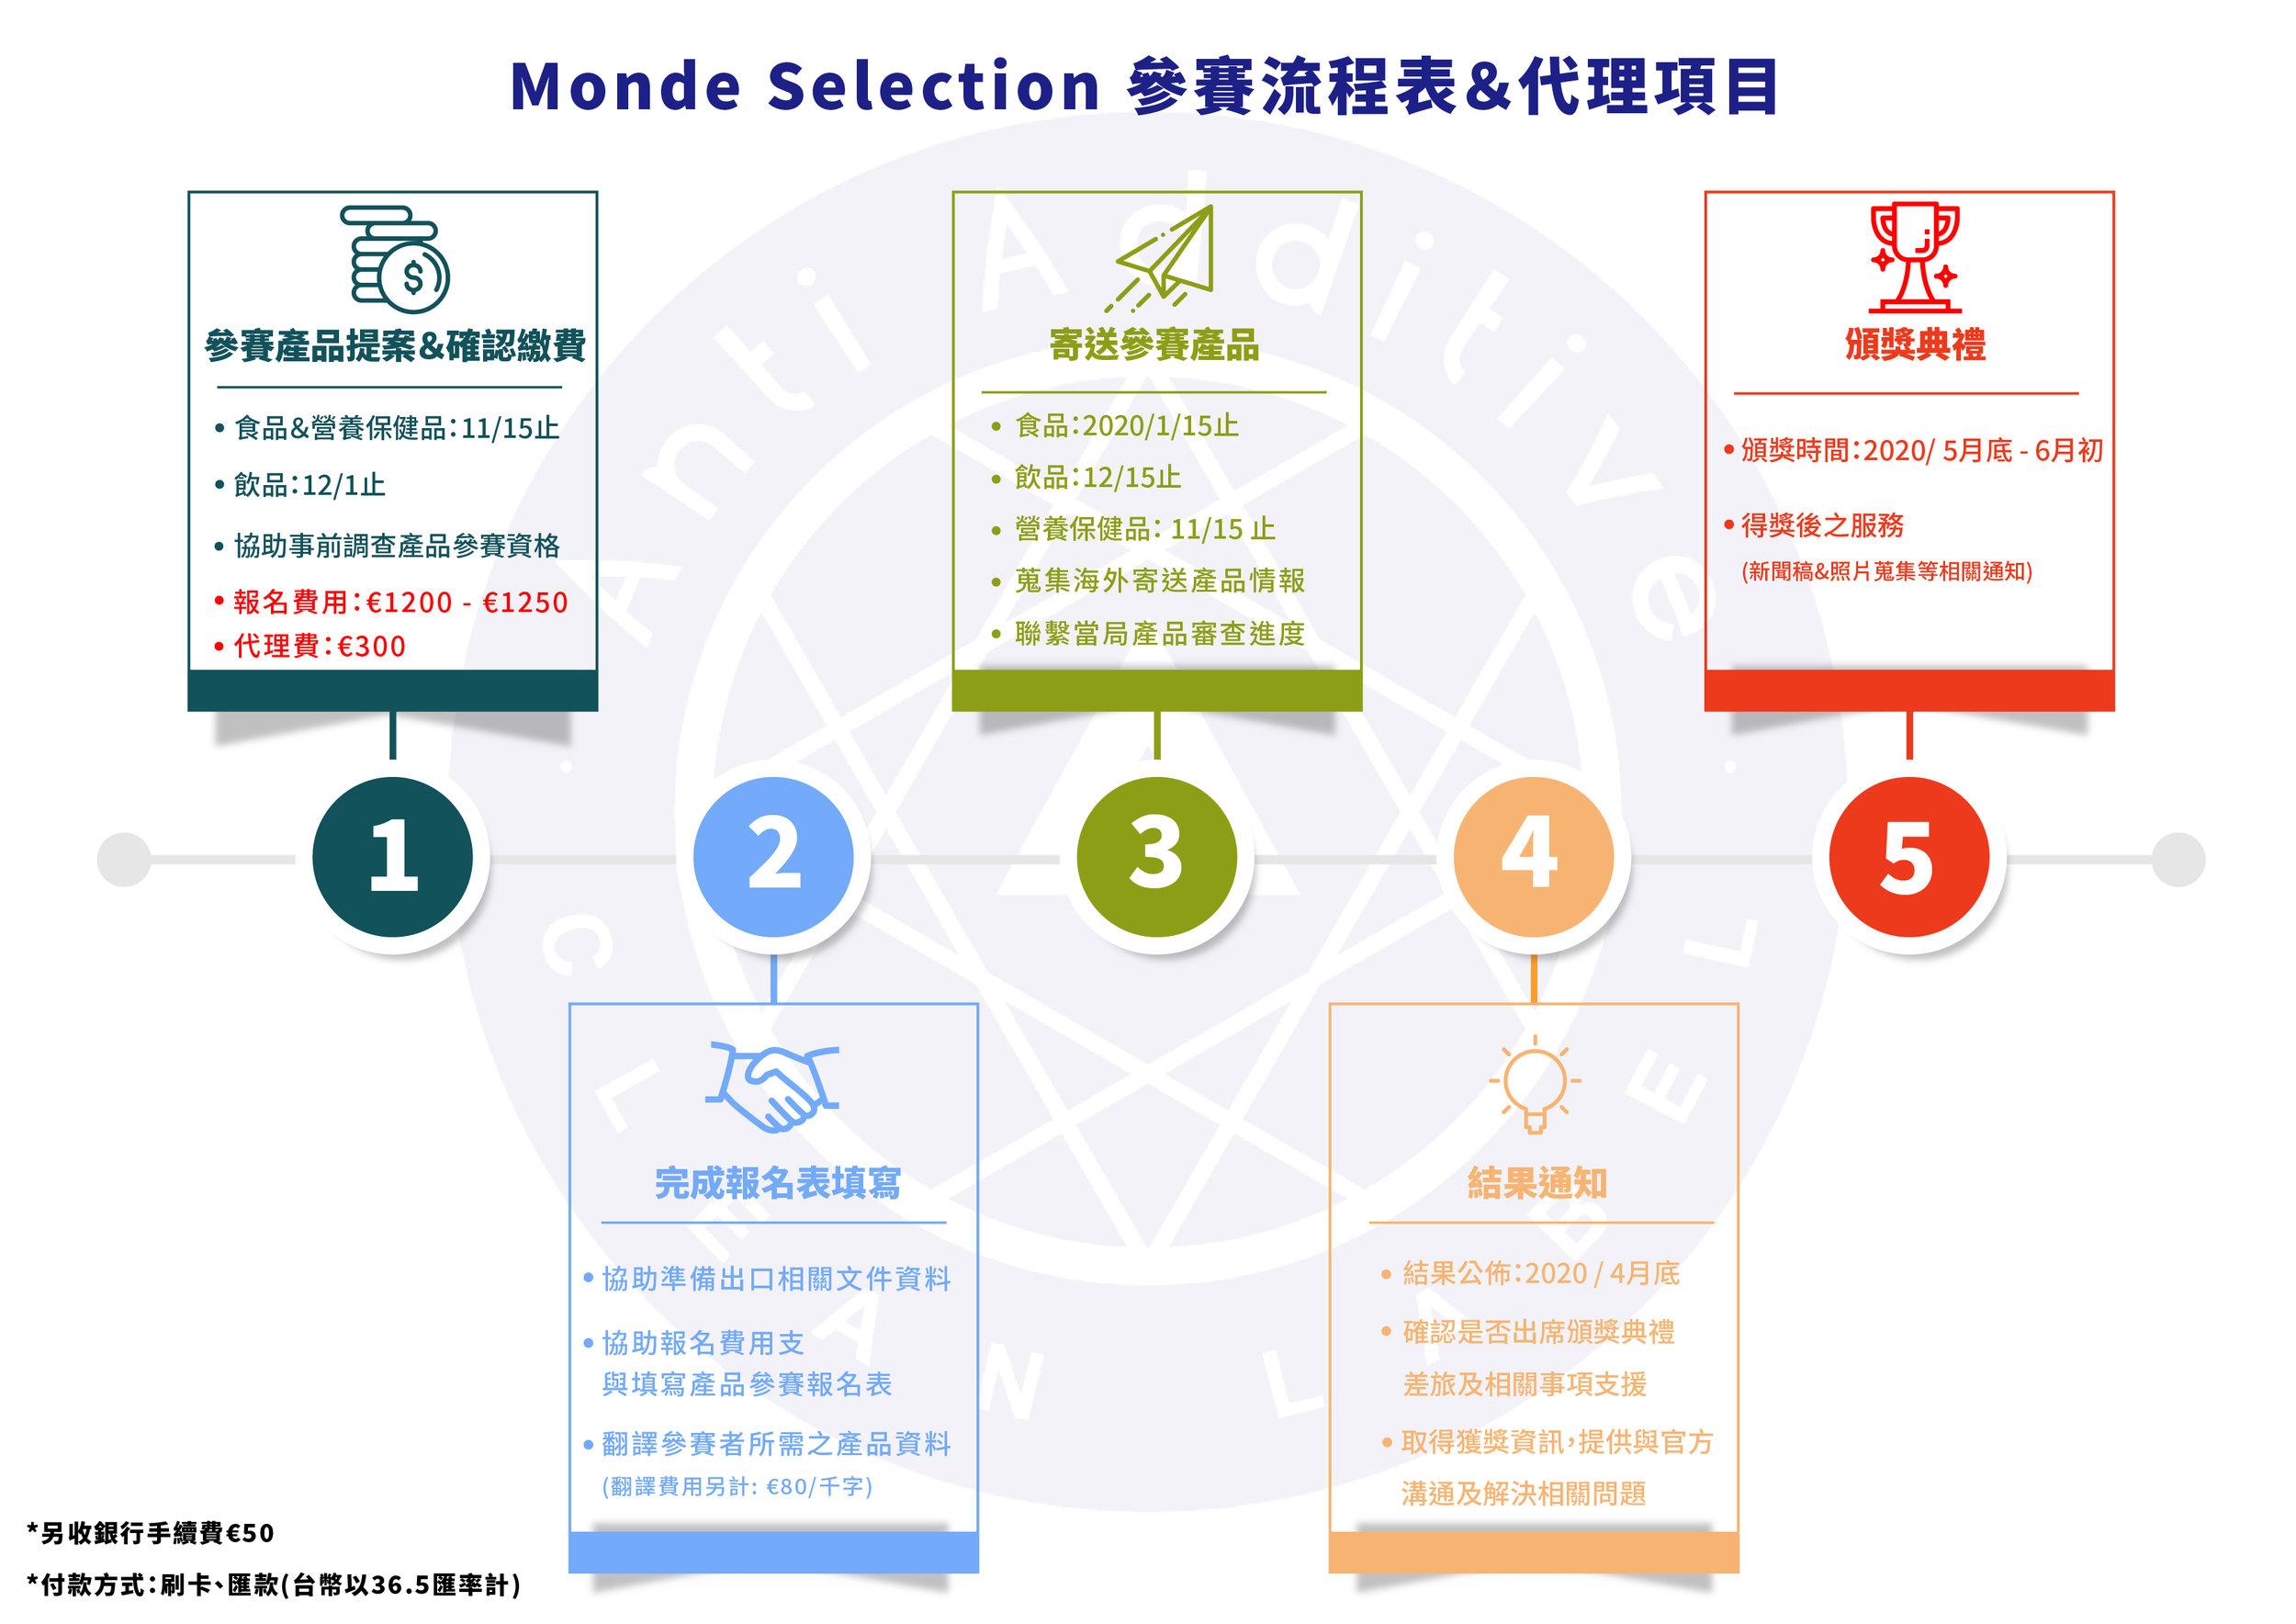 - Monde Selection 代理項目1. 參賽產品提案2. 協助事前調查產品參賽資格3. 蒐集海外寄送產品情報4. 協助準備出口相關文件資料5. 協助報名費用支付與填寫產品參賽報名表6. 翻譯所有參賽者所需芝產品資料 (翻譯費用另計: €80/千字)7. 聯繫當局產品審查進度8. 確認是否出席頒獎典禮, 差旅及相關事項支援9. 取得獲獎資訊, 提供與官方溝通及解決相關問題10. 得獎後的服務 (新聞稿&照片蒐集等相關通知)